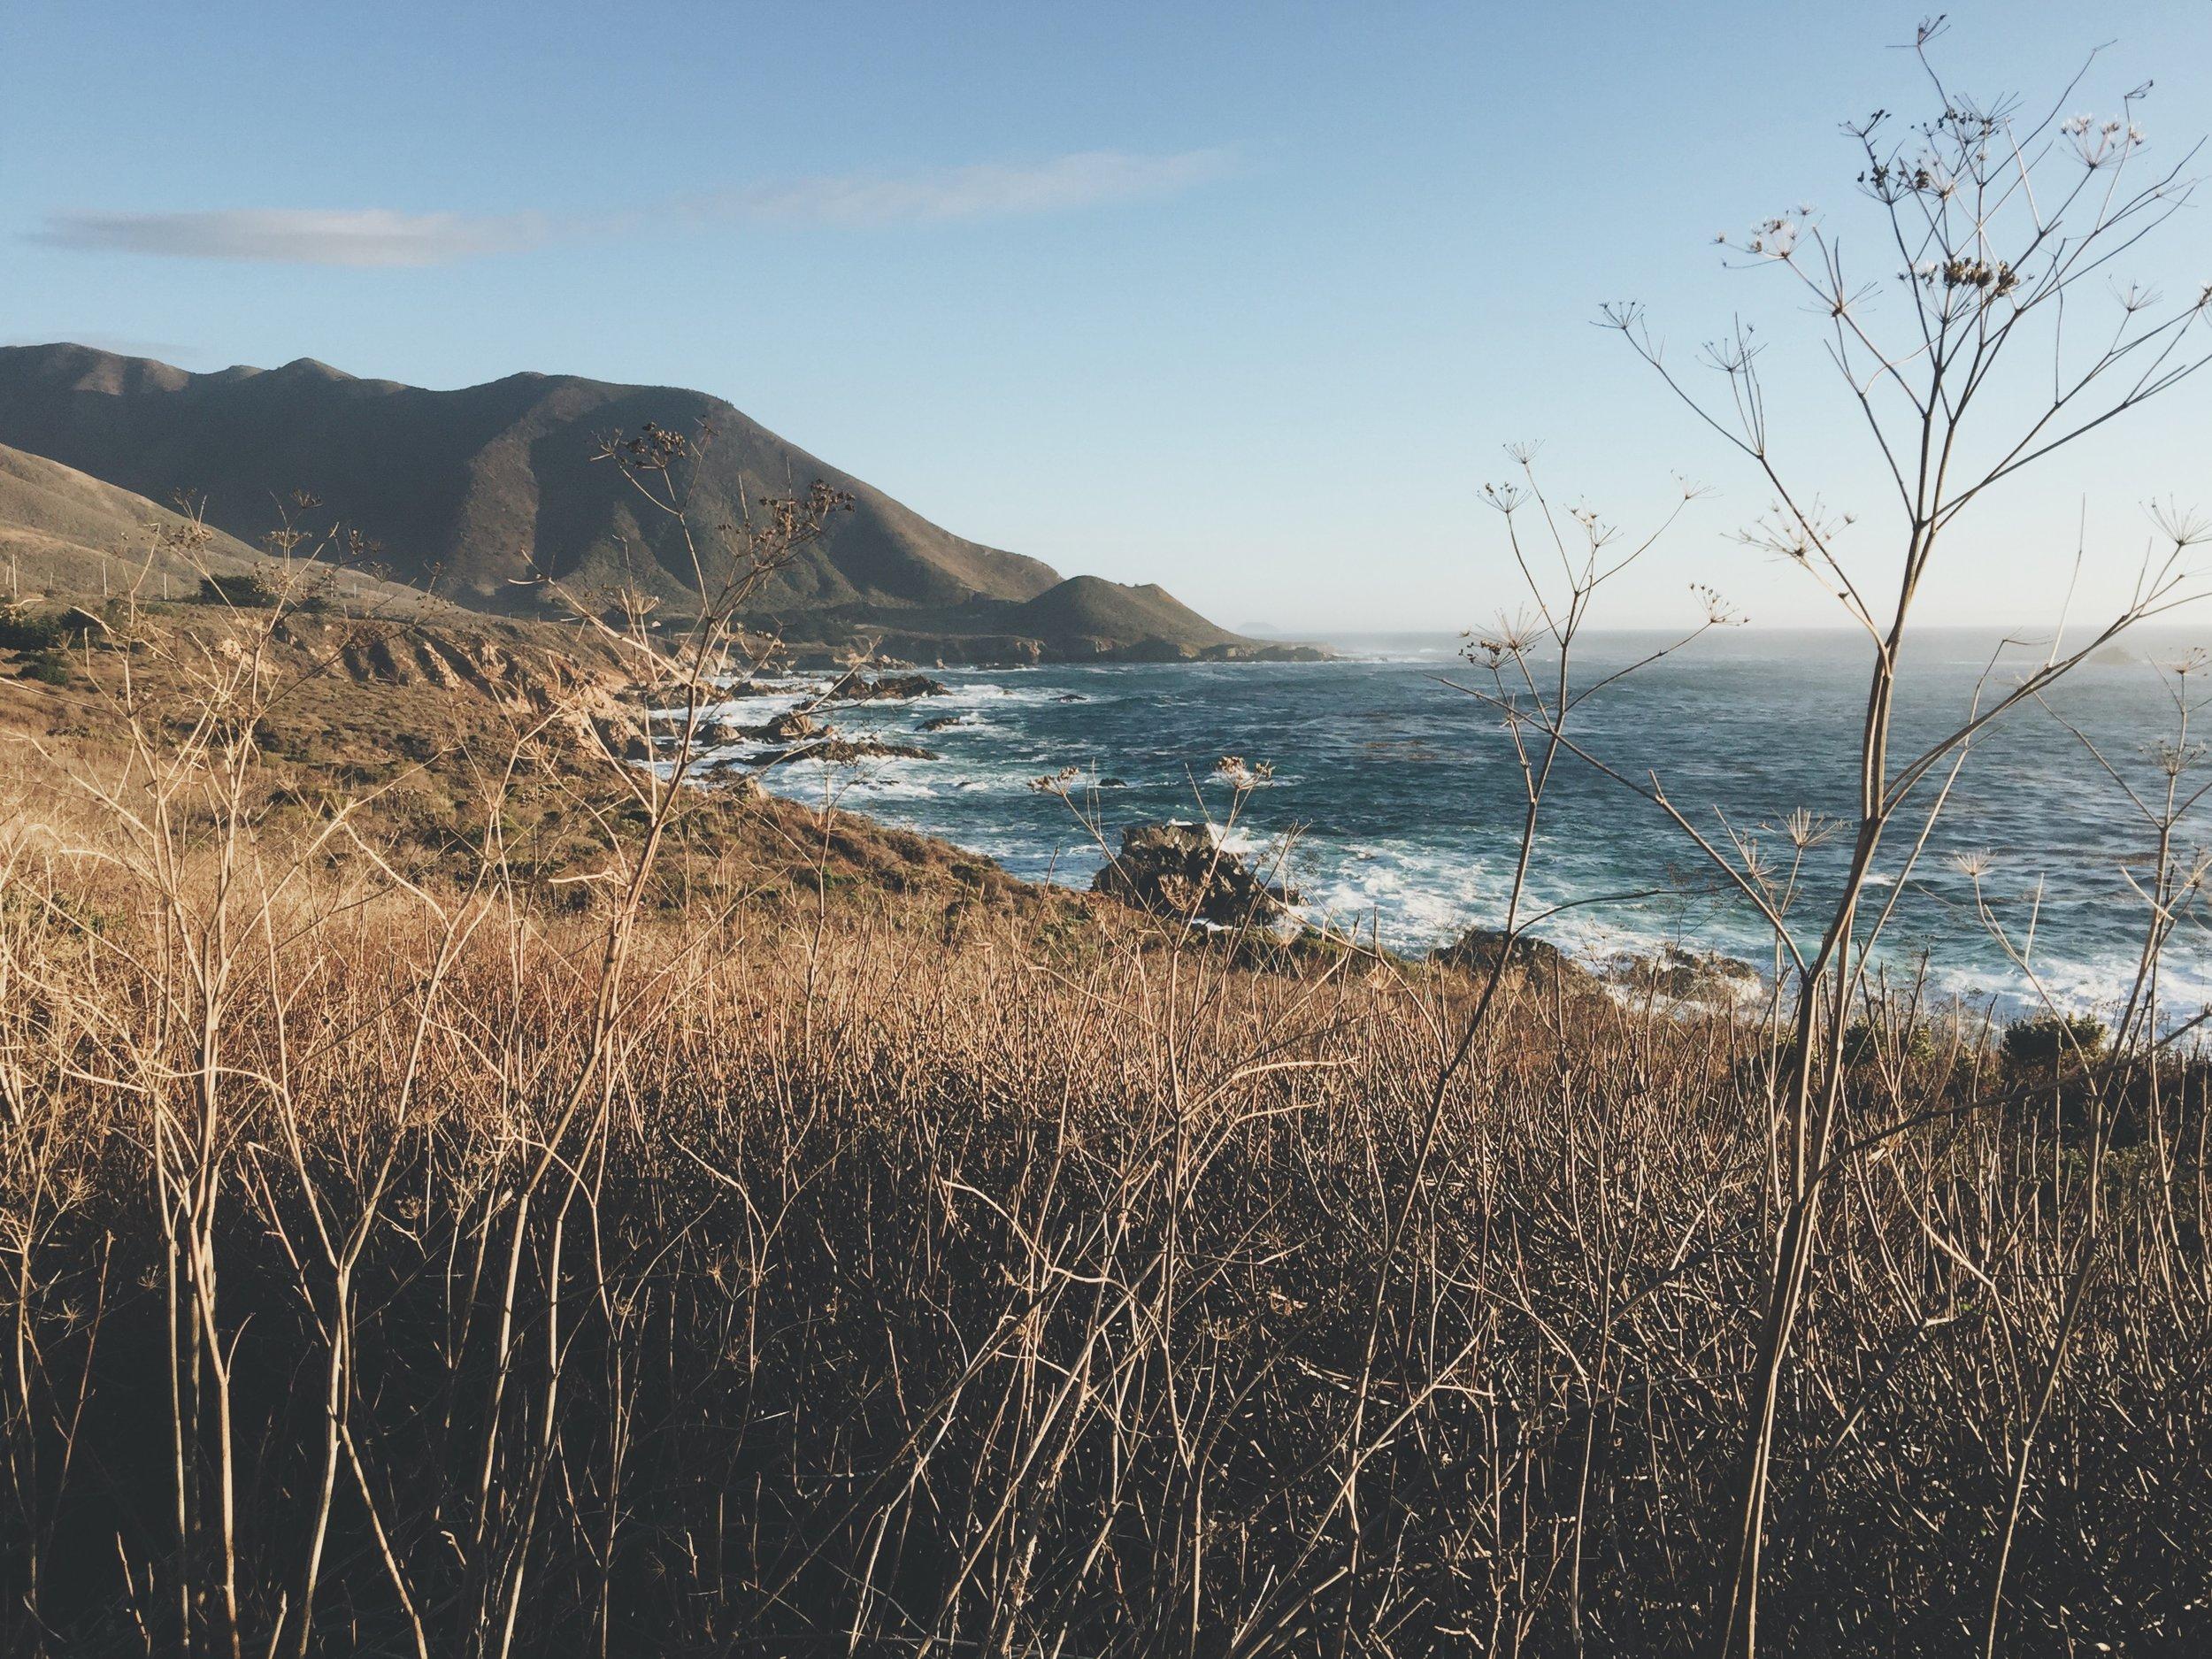 Big Sur California by Ricky Stephens of A Modern Villain